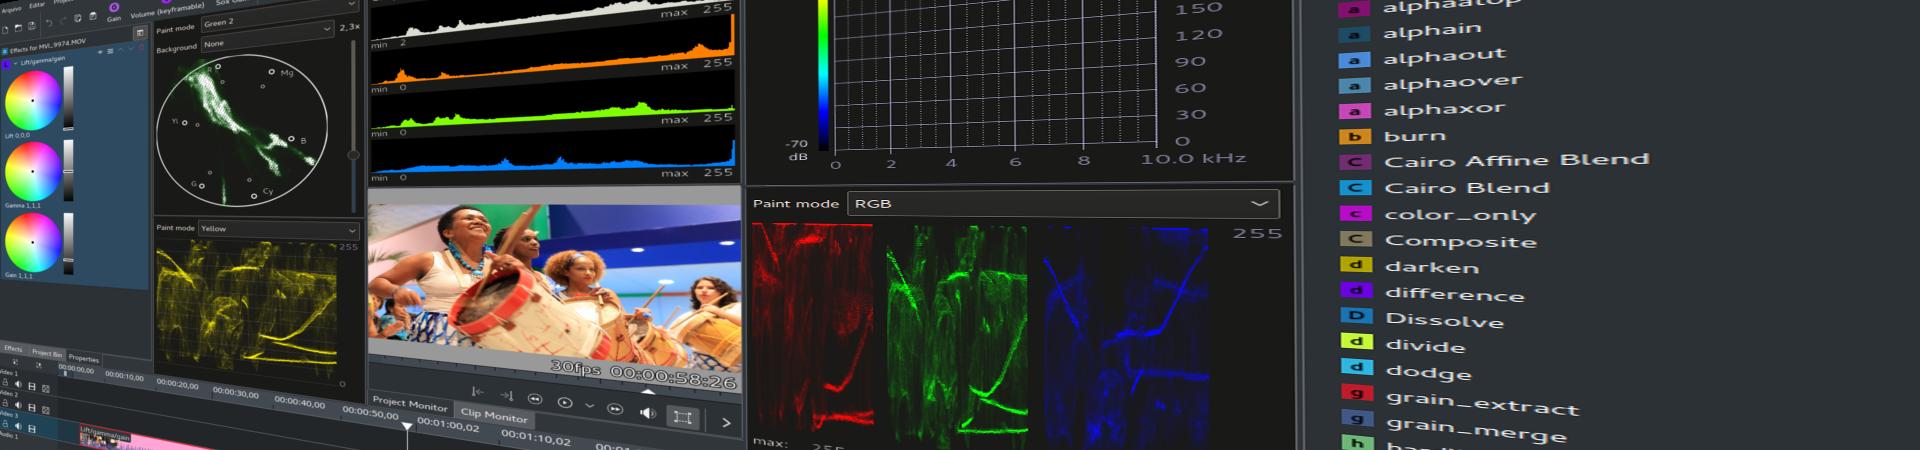 data/pics/splash-background.png